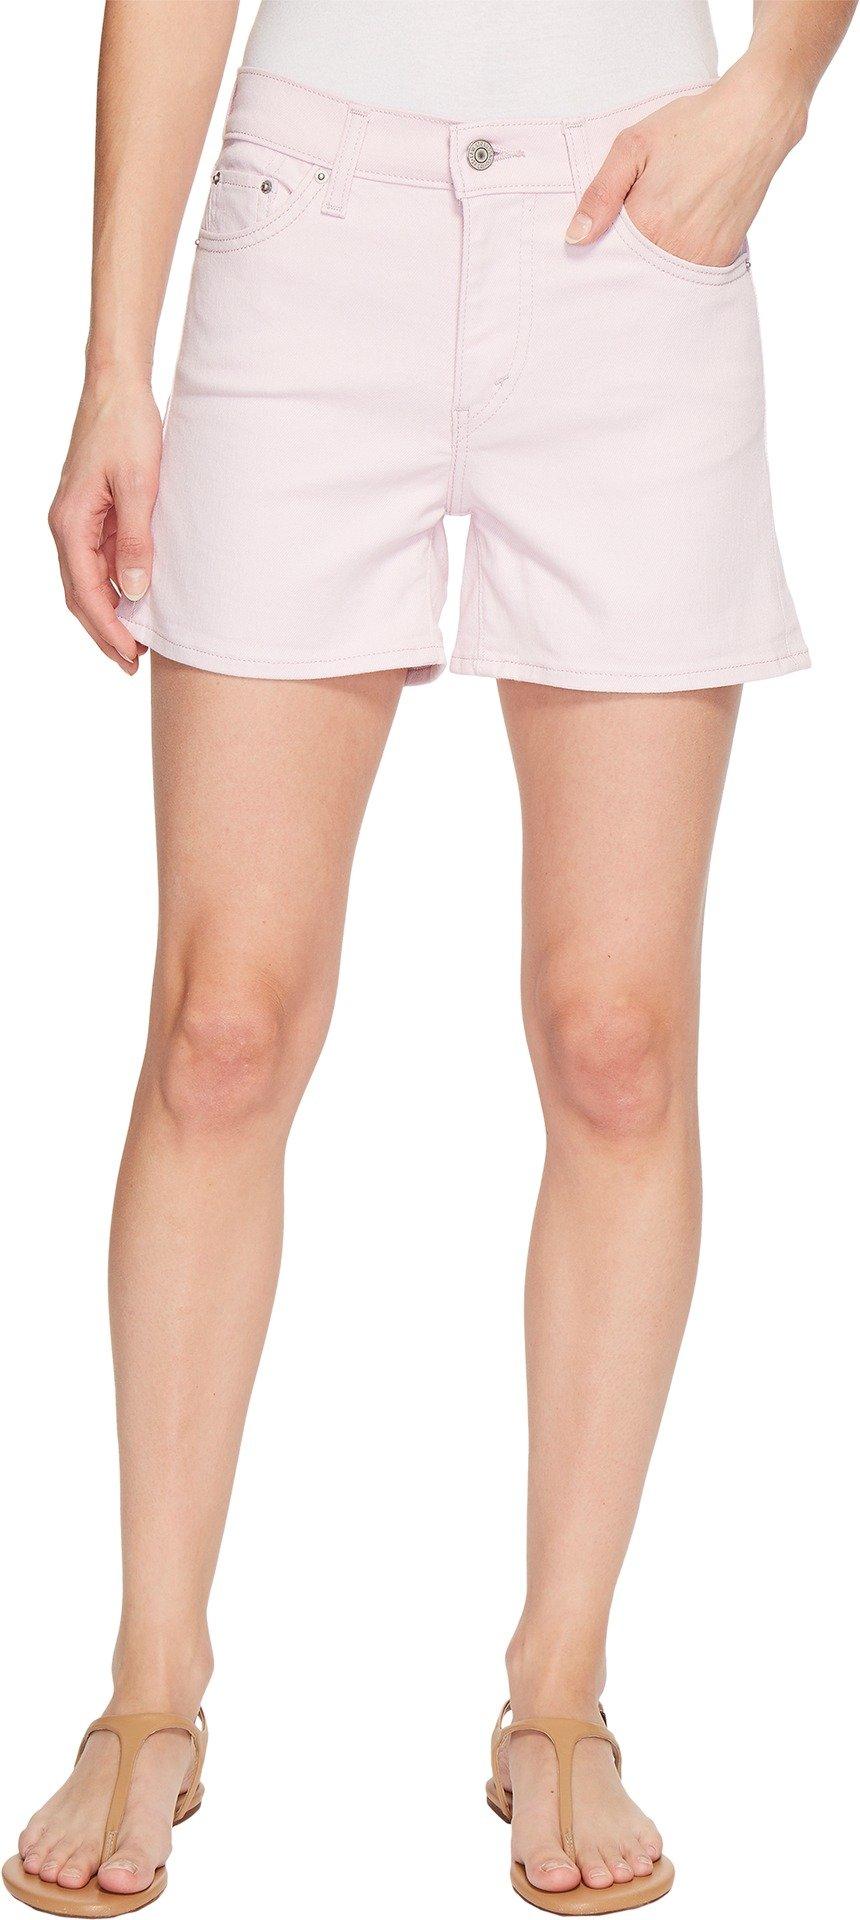 Levi's? Womens Women's High-Rise Shorts Soft Light Lilac 33 2.5